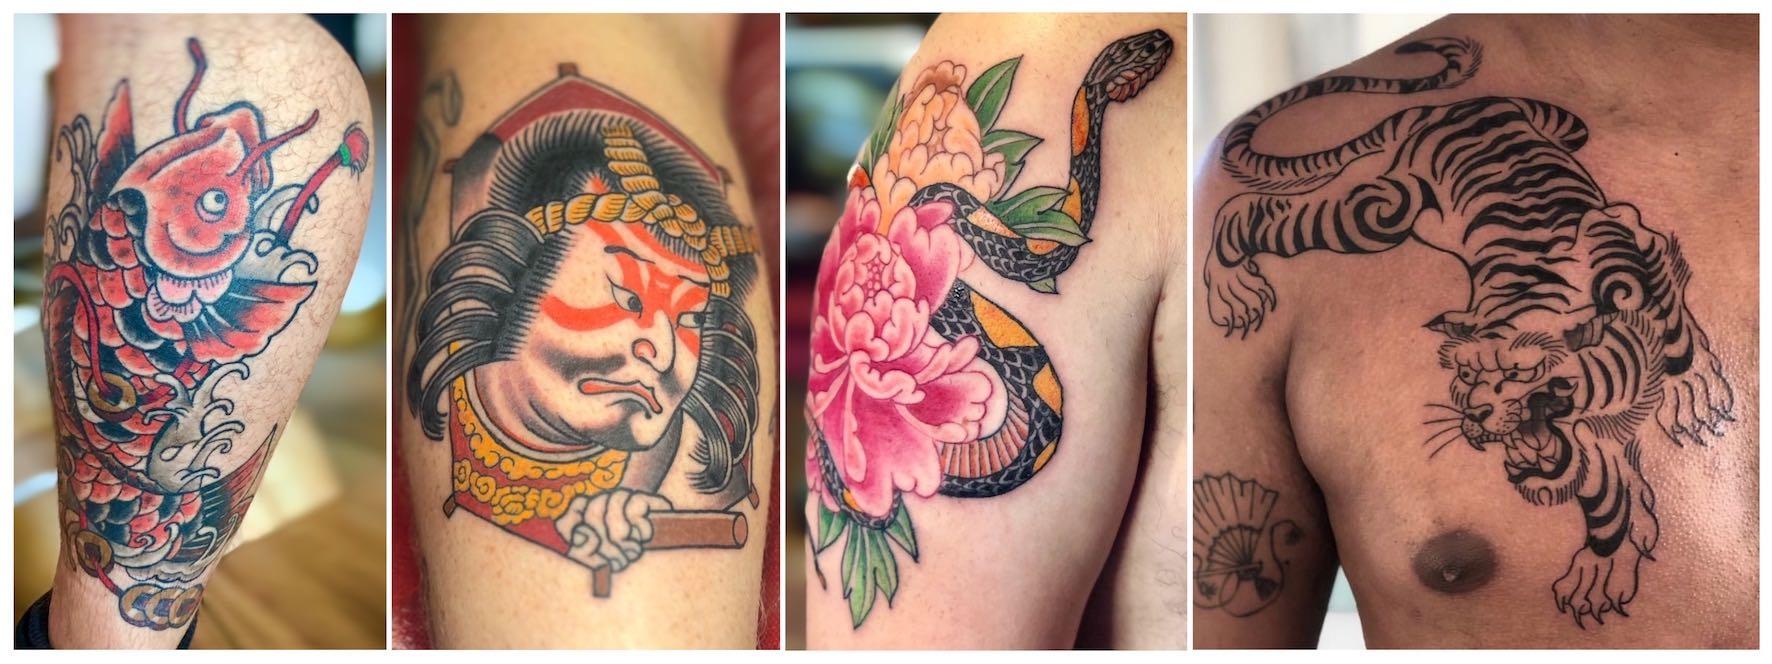 Japanese tattoos done by Daniel Feinberg